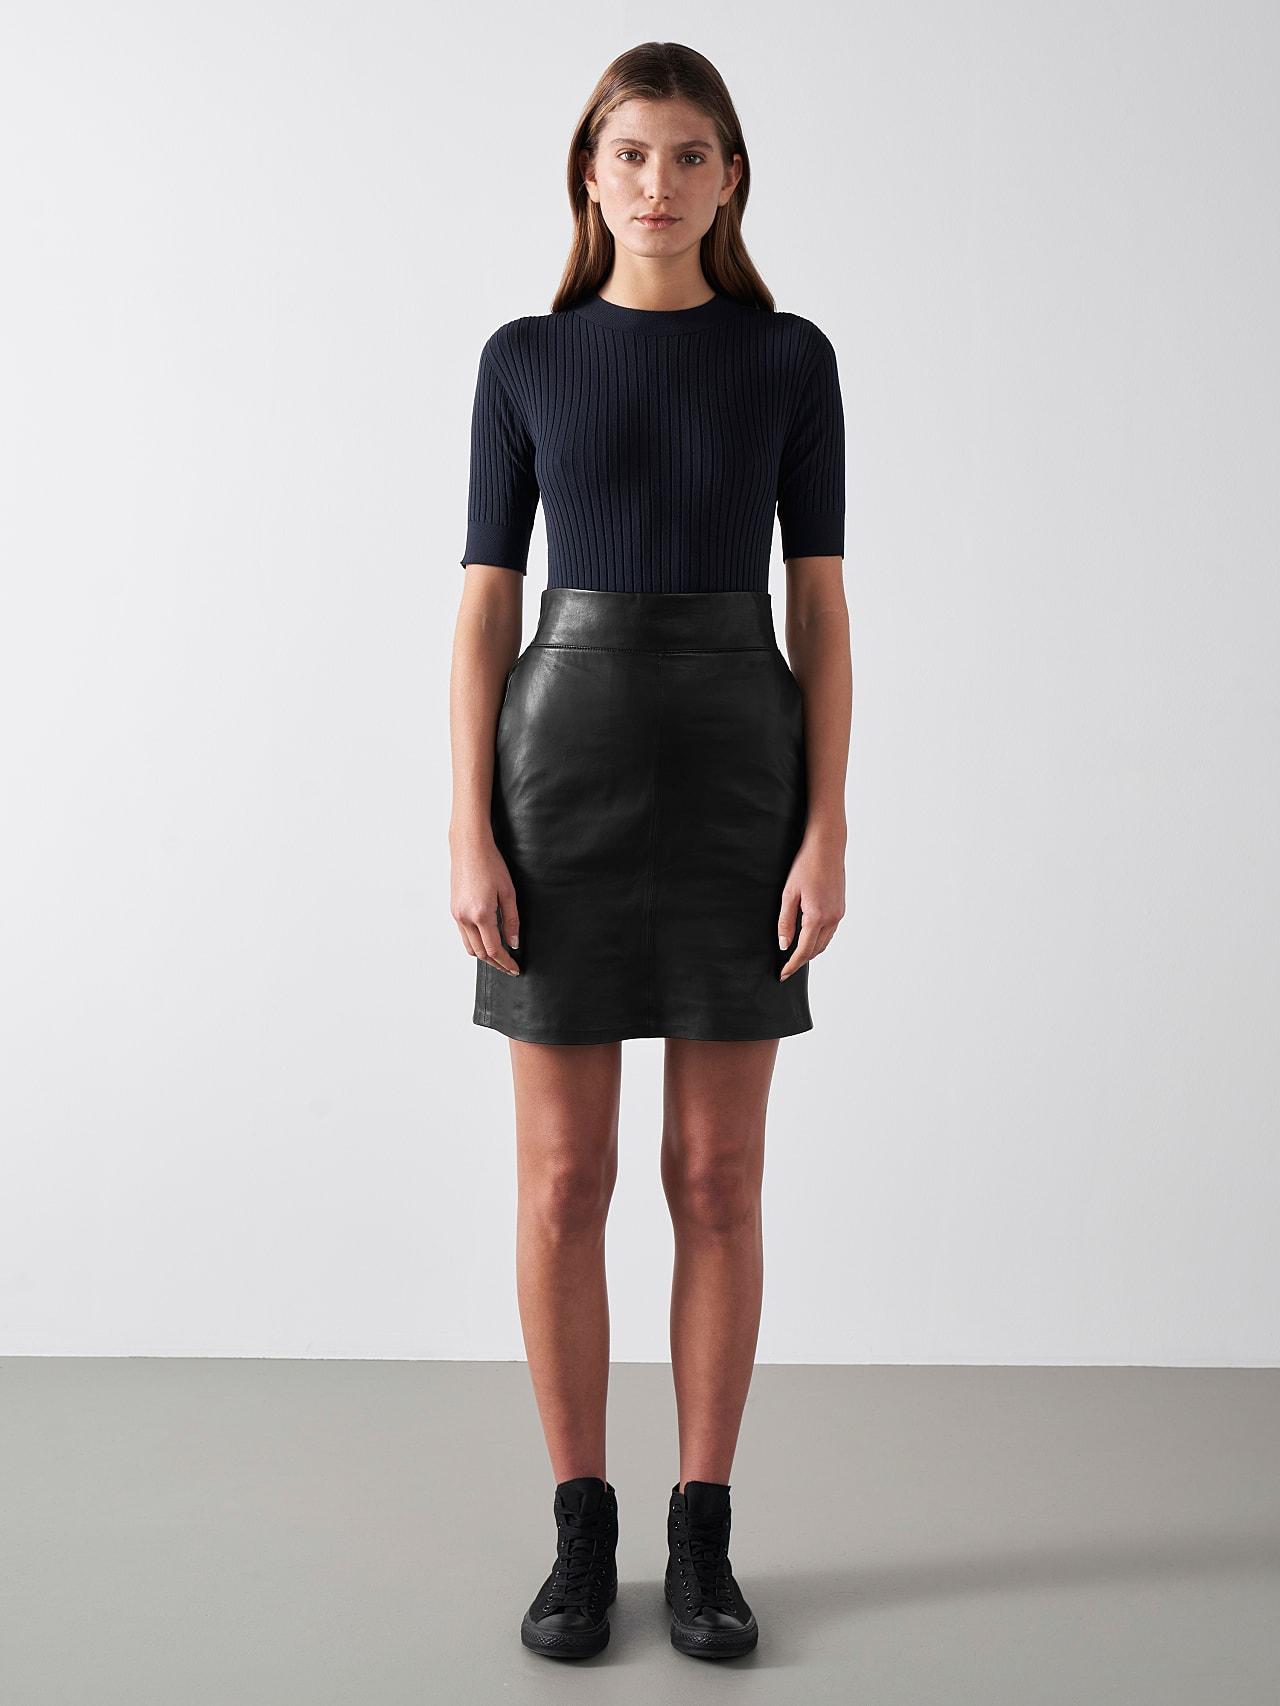 LEXSI V1.Y5.01 Leather Pencil Skirt black Front Alpha Tauri